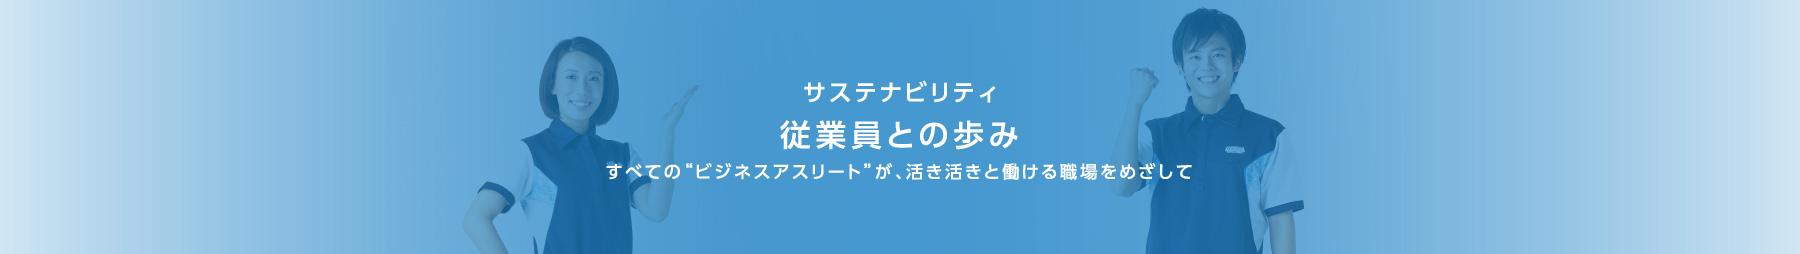 "CSRお客様とのあゆみ すべての""ビジネスアスリート""が、活き活きと働ける職場を目指して"